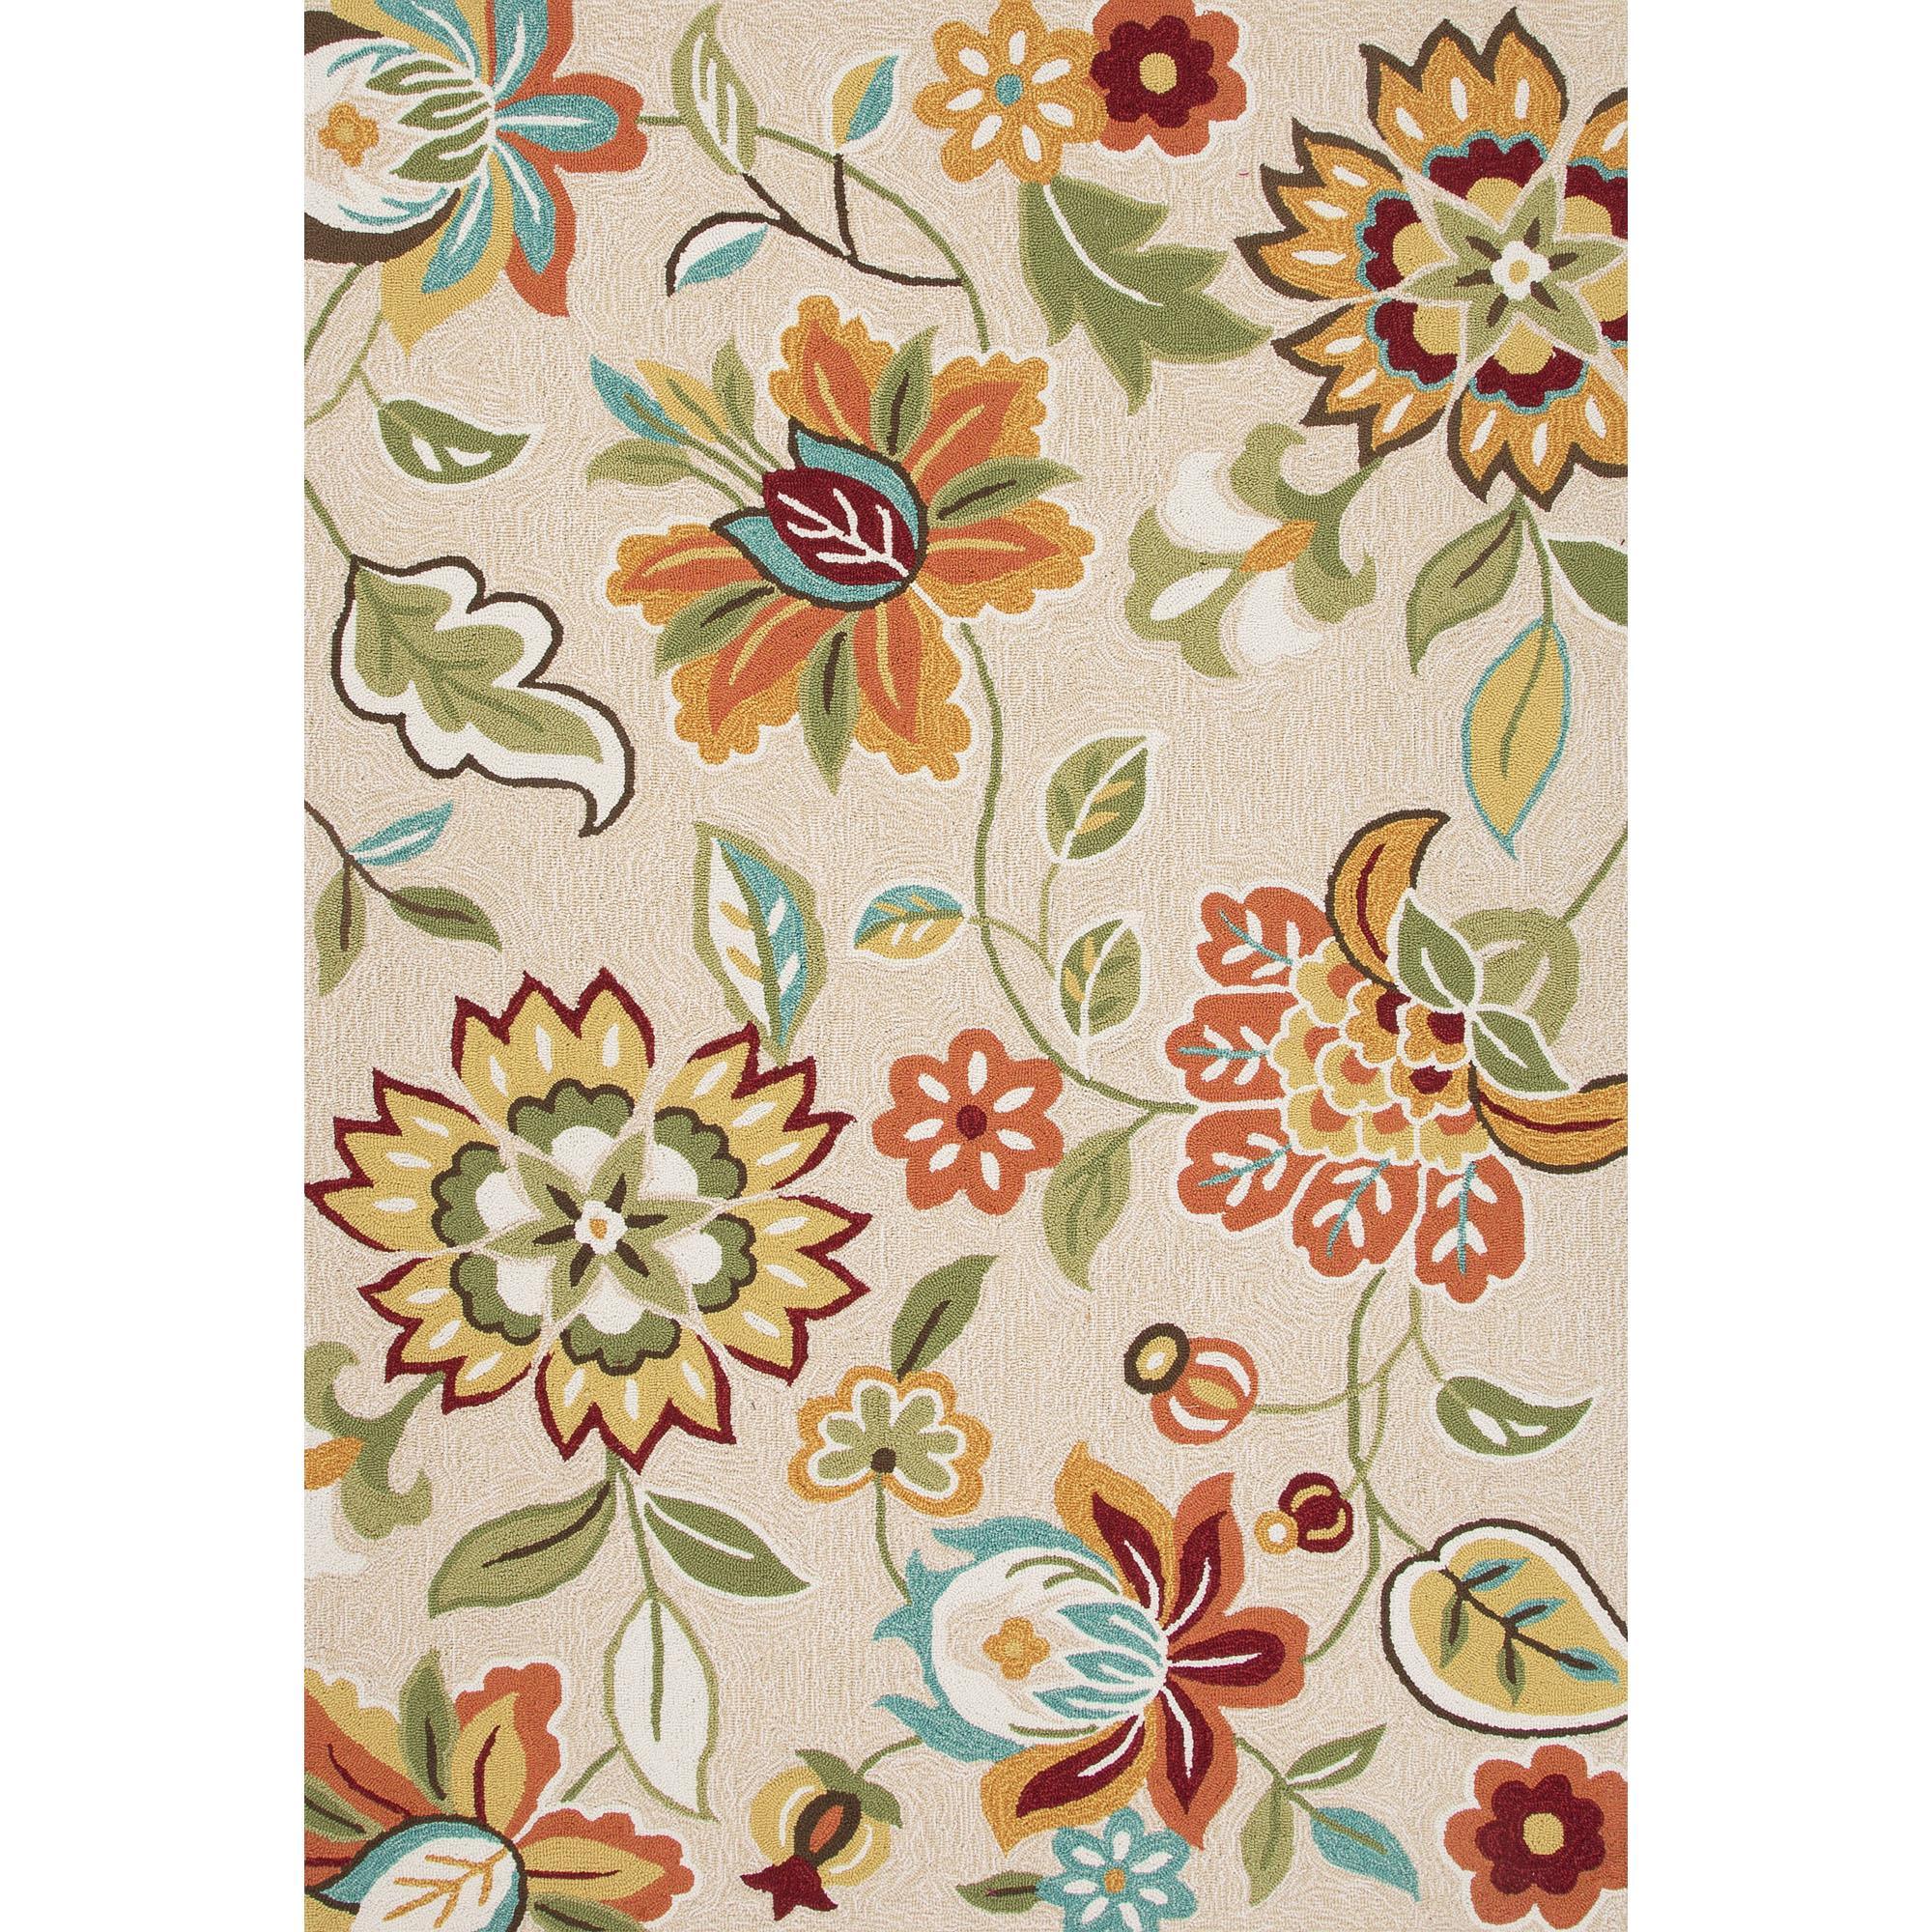 JAIPUR Rugs Blossom 5 x 7.6 Rug - Item Number: RUG120773